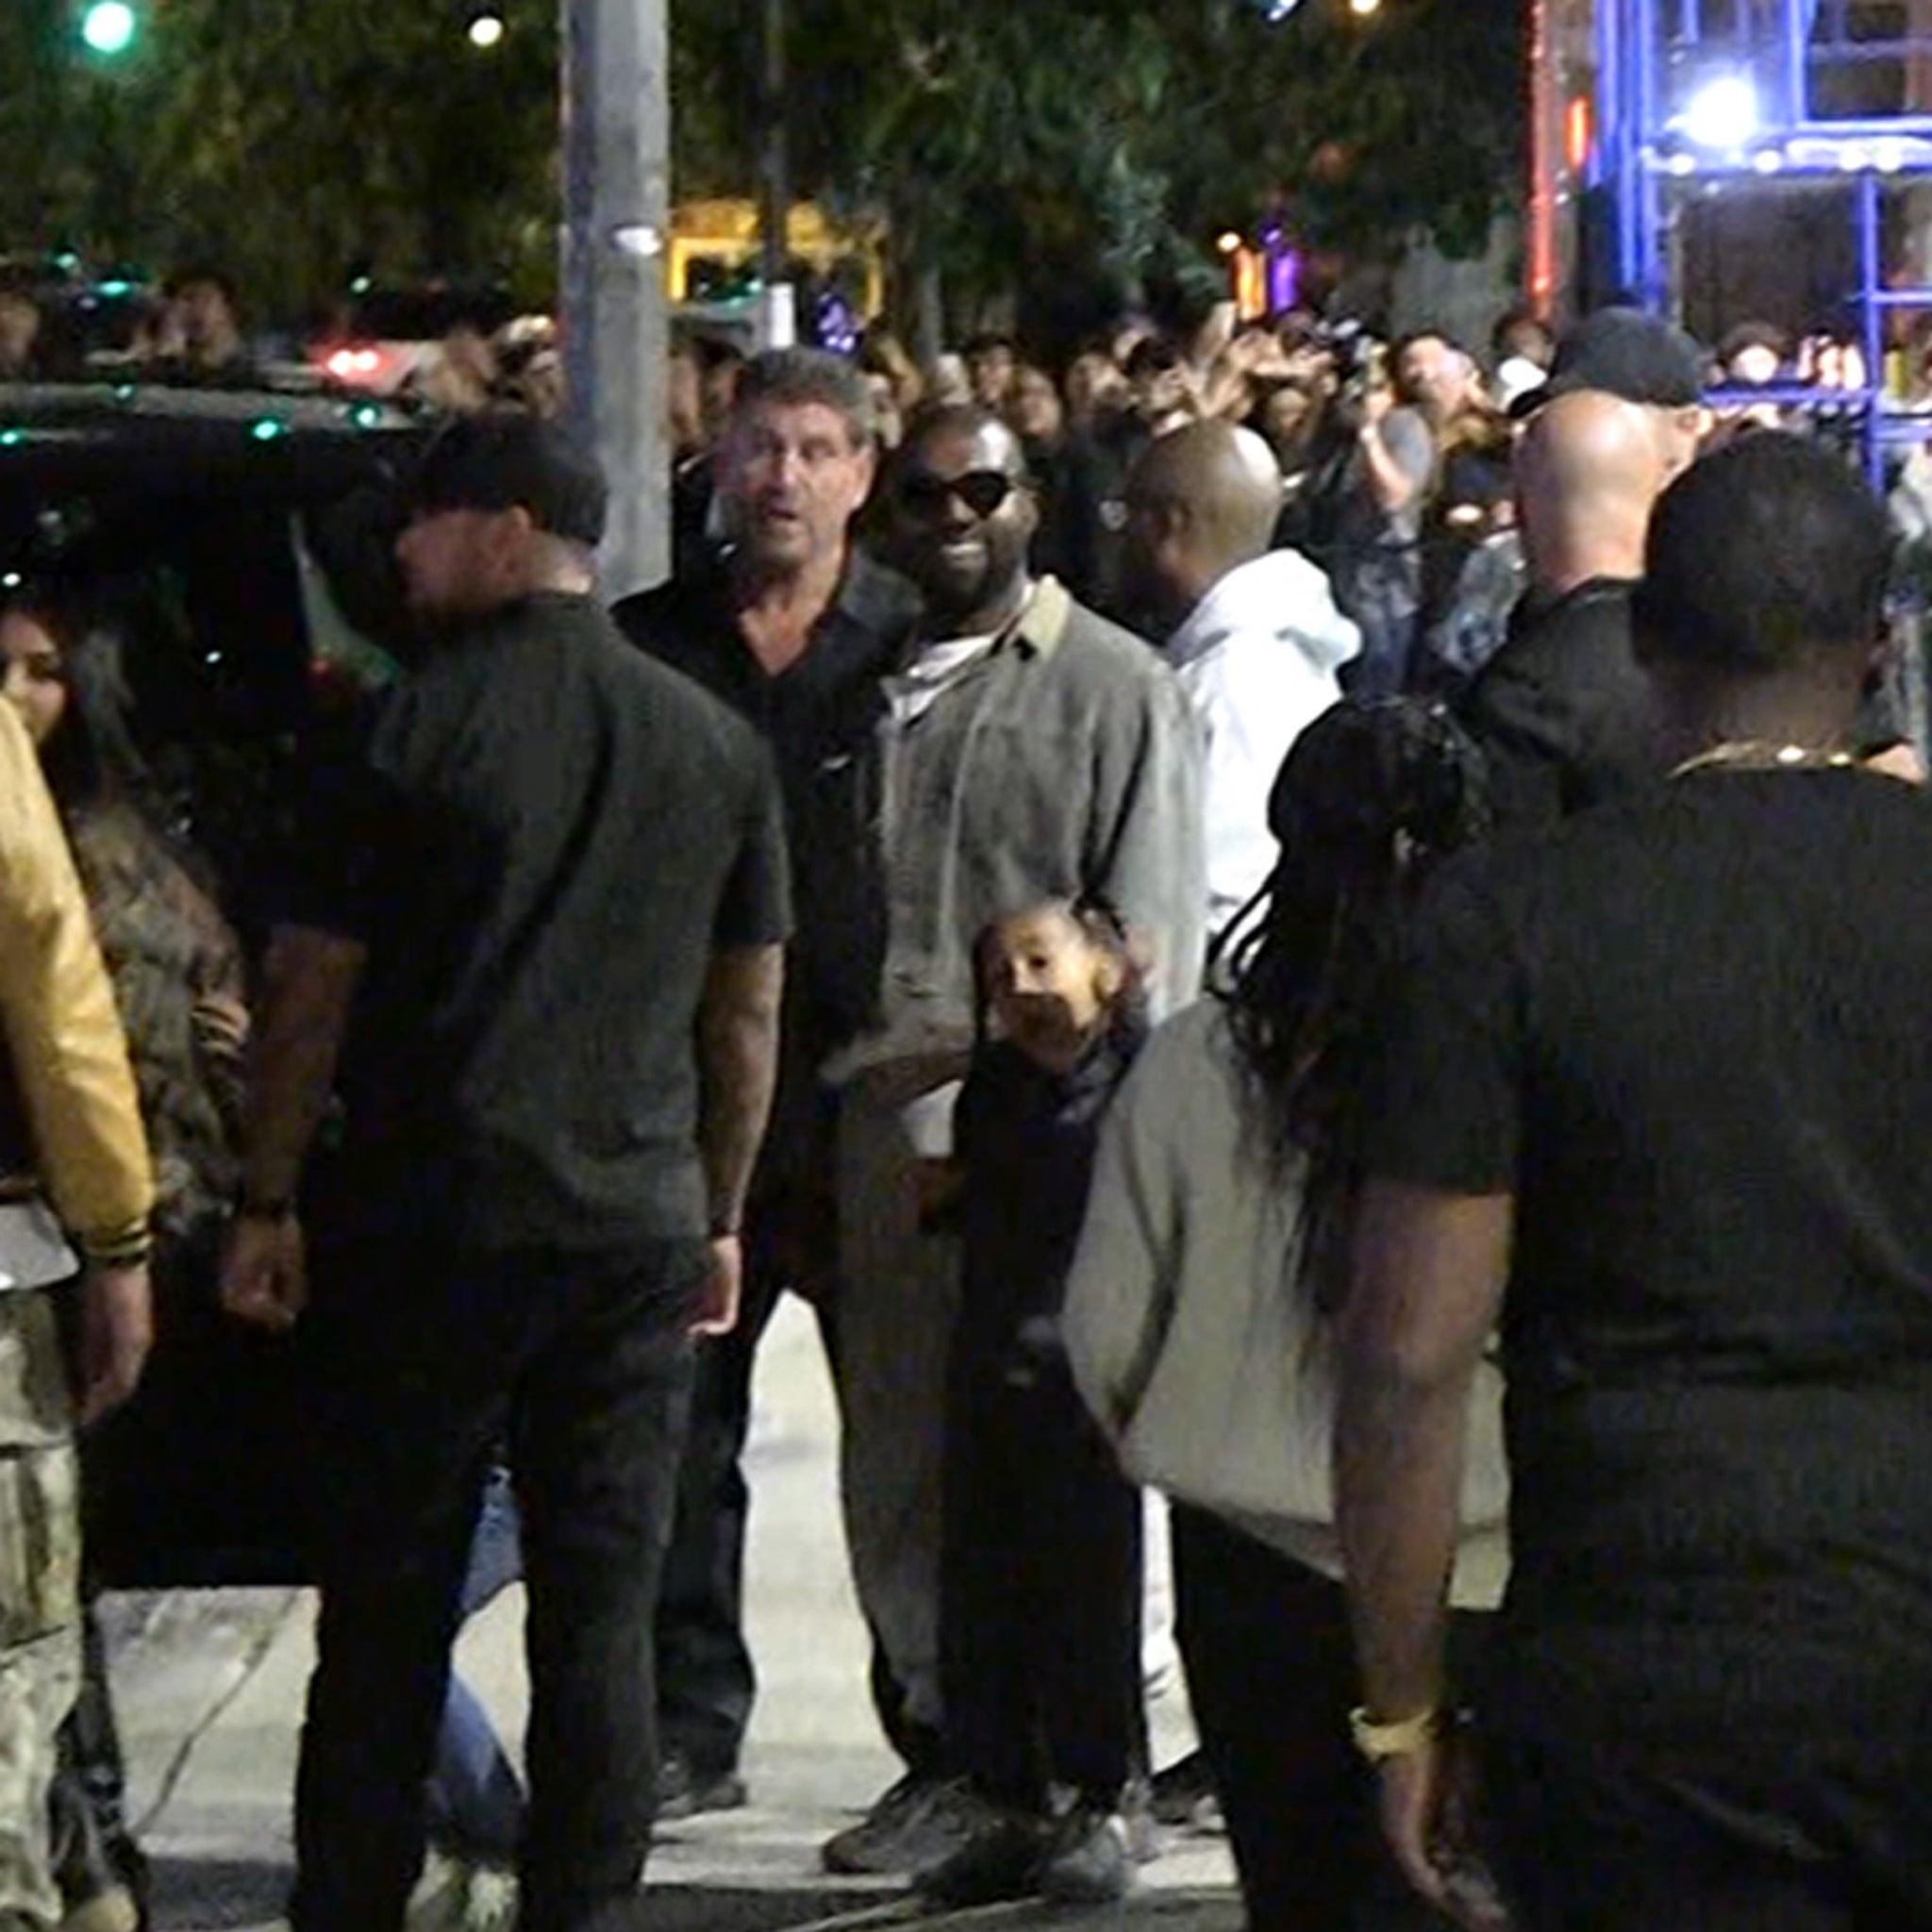 Kanye West All Smiles Despite Not Releasing Album